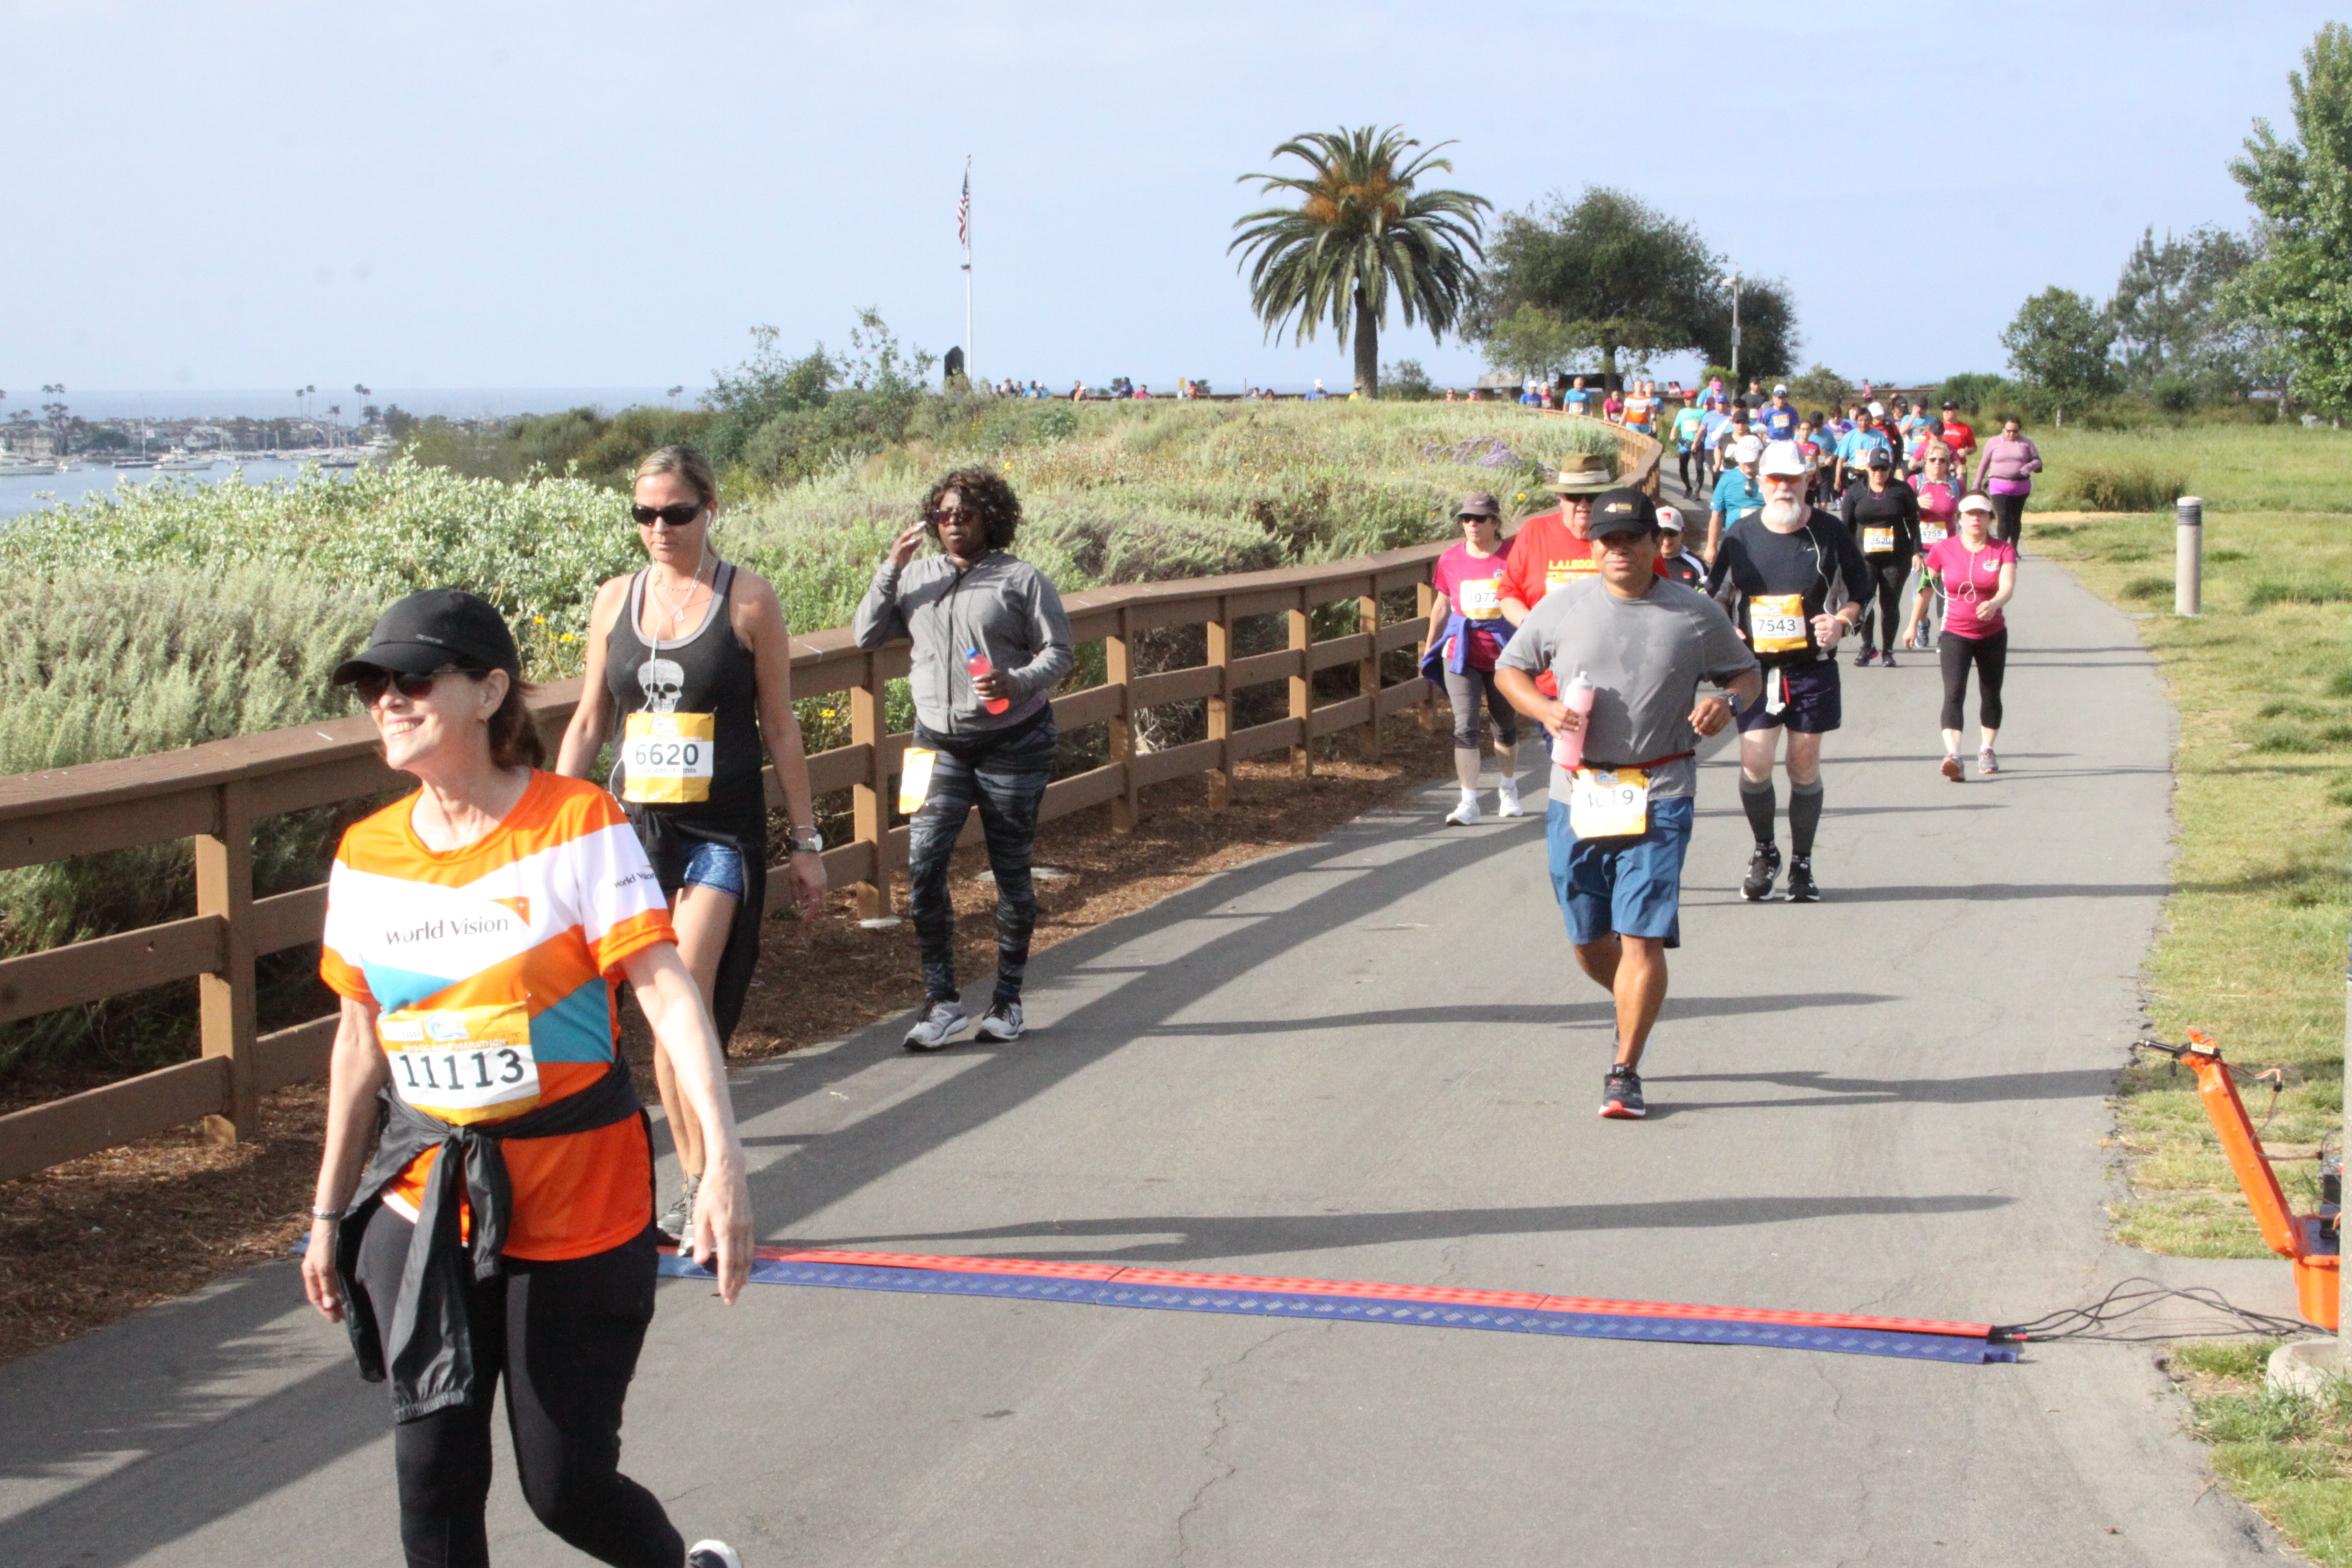 Rahbin Shyne (3rd from left) walking in the OC Half-Marathon